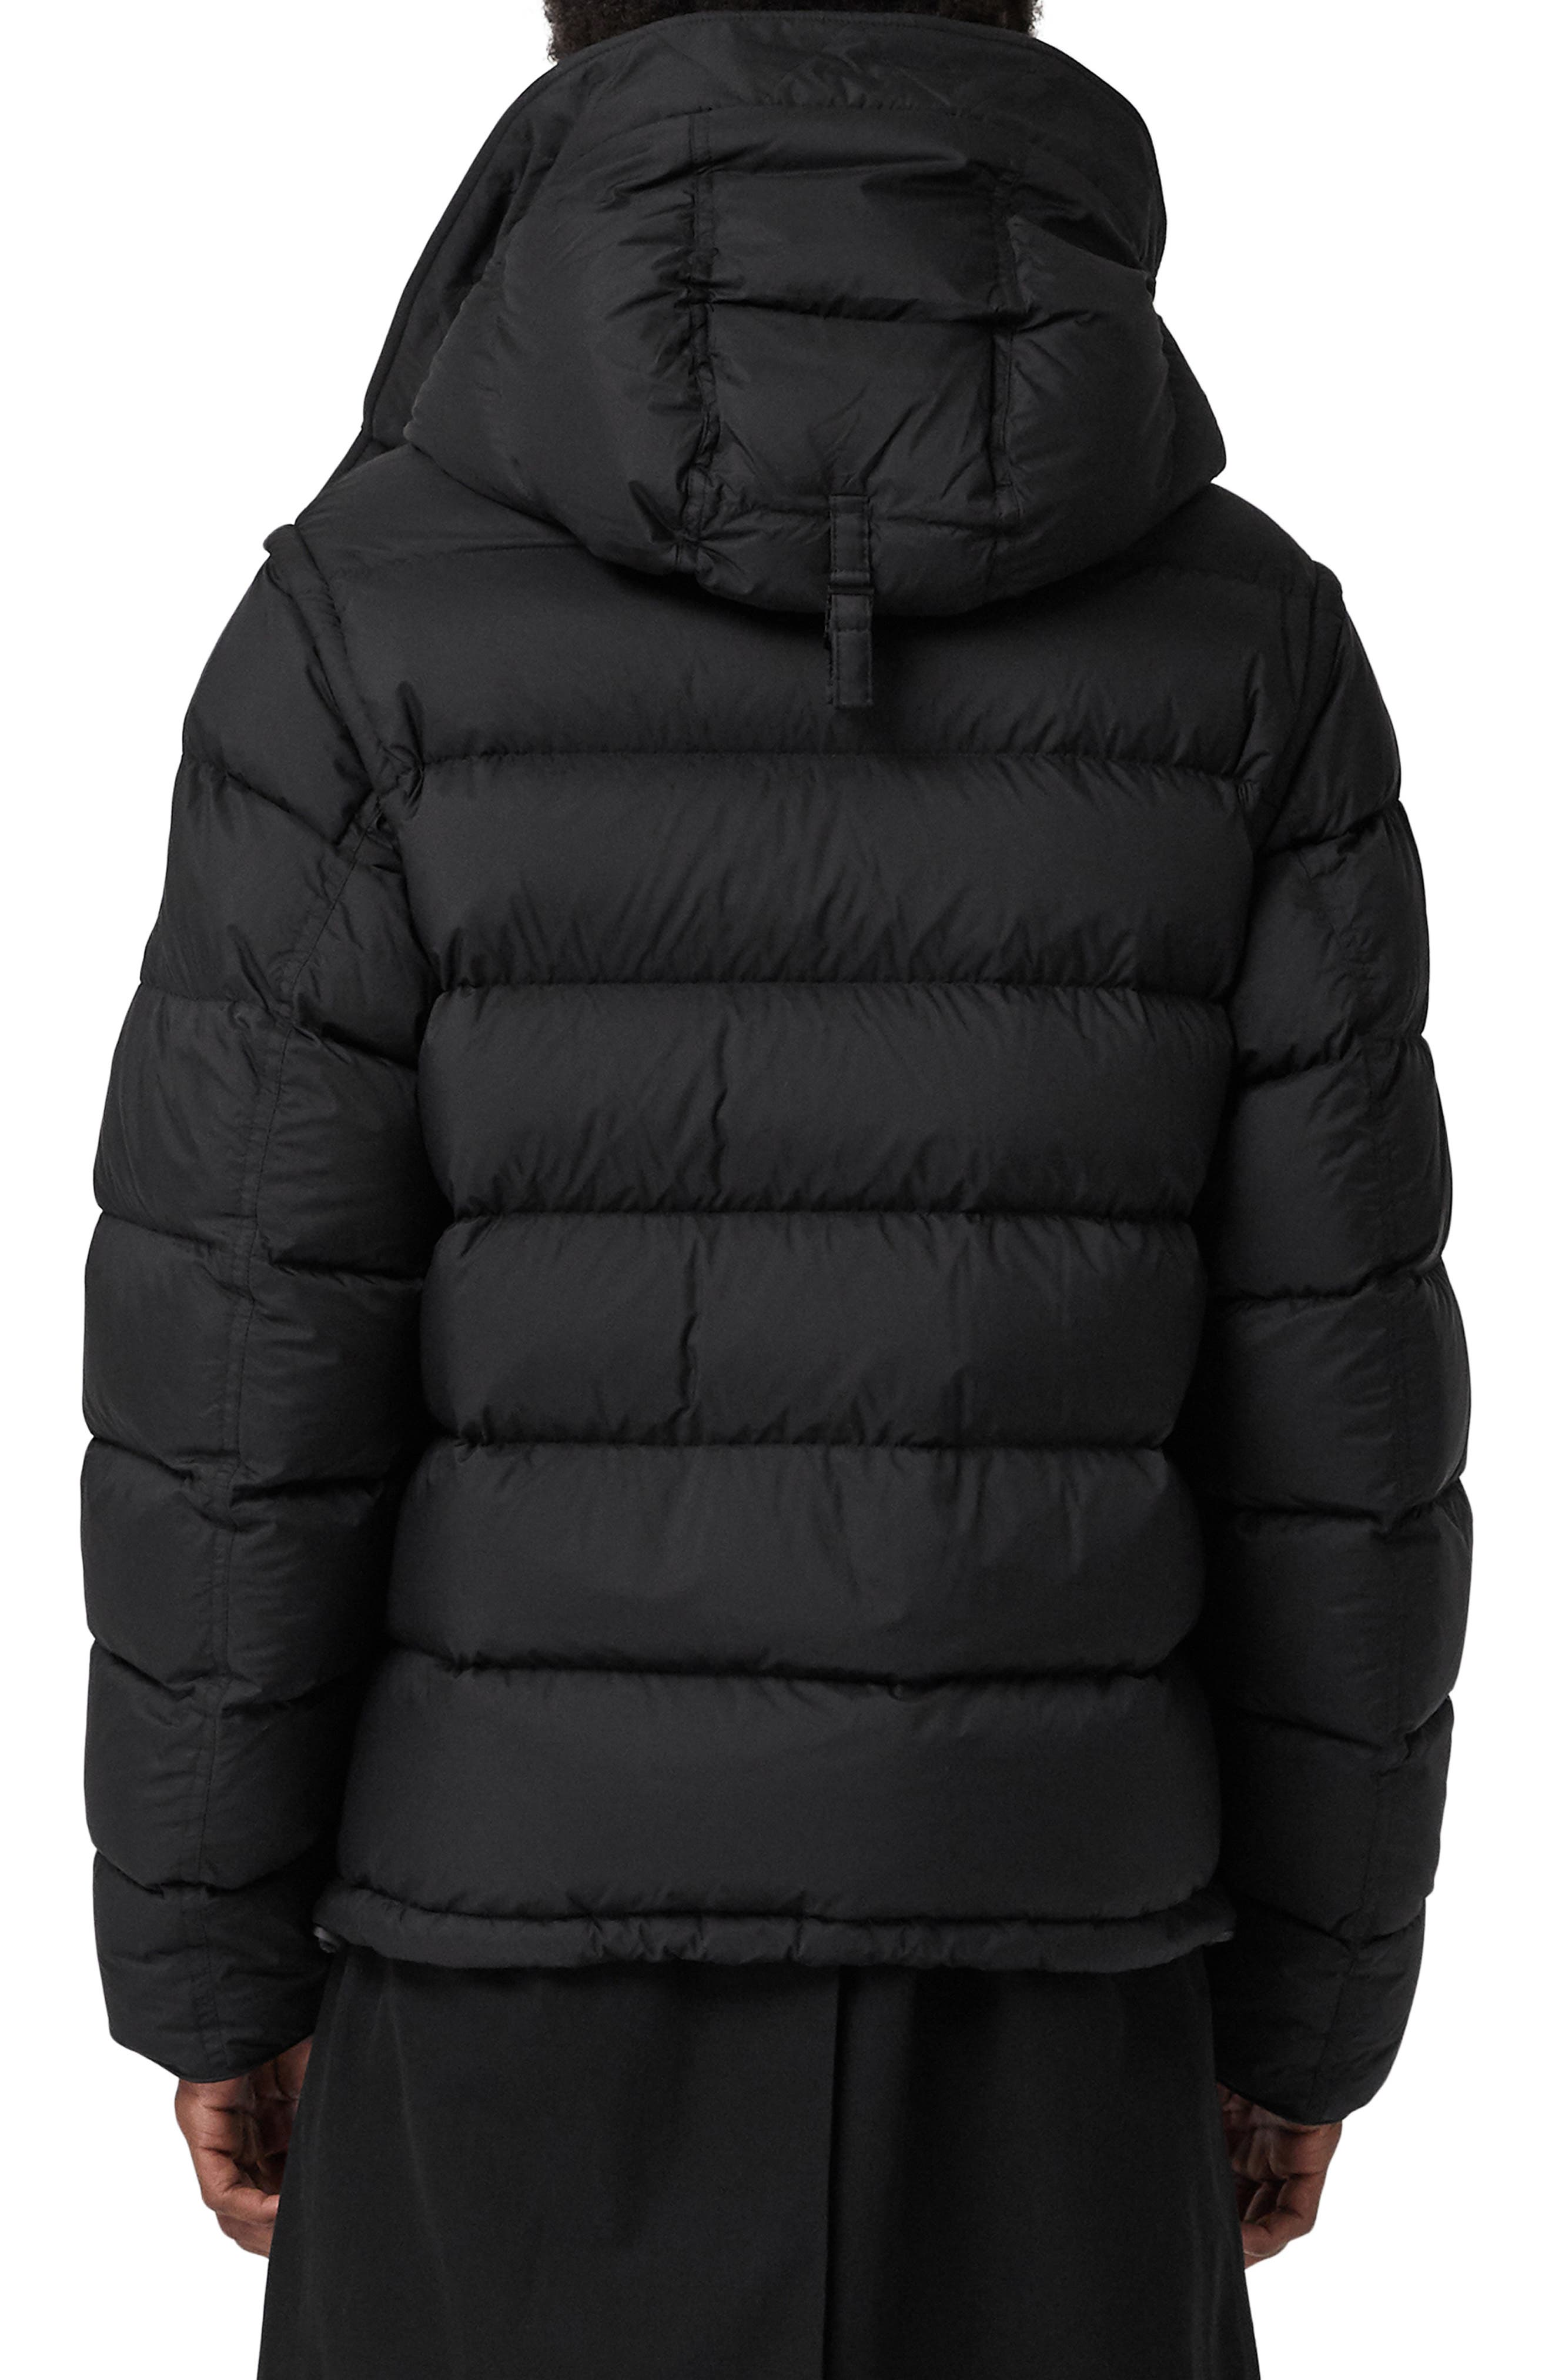 Hartley Hybrid Jacket with Detachable Sleeves,                             Alternate thumbnail 3, color,                             001